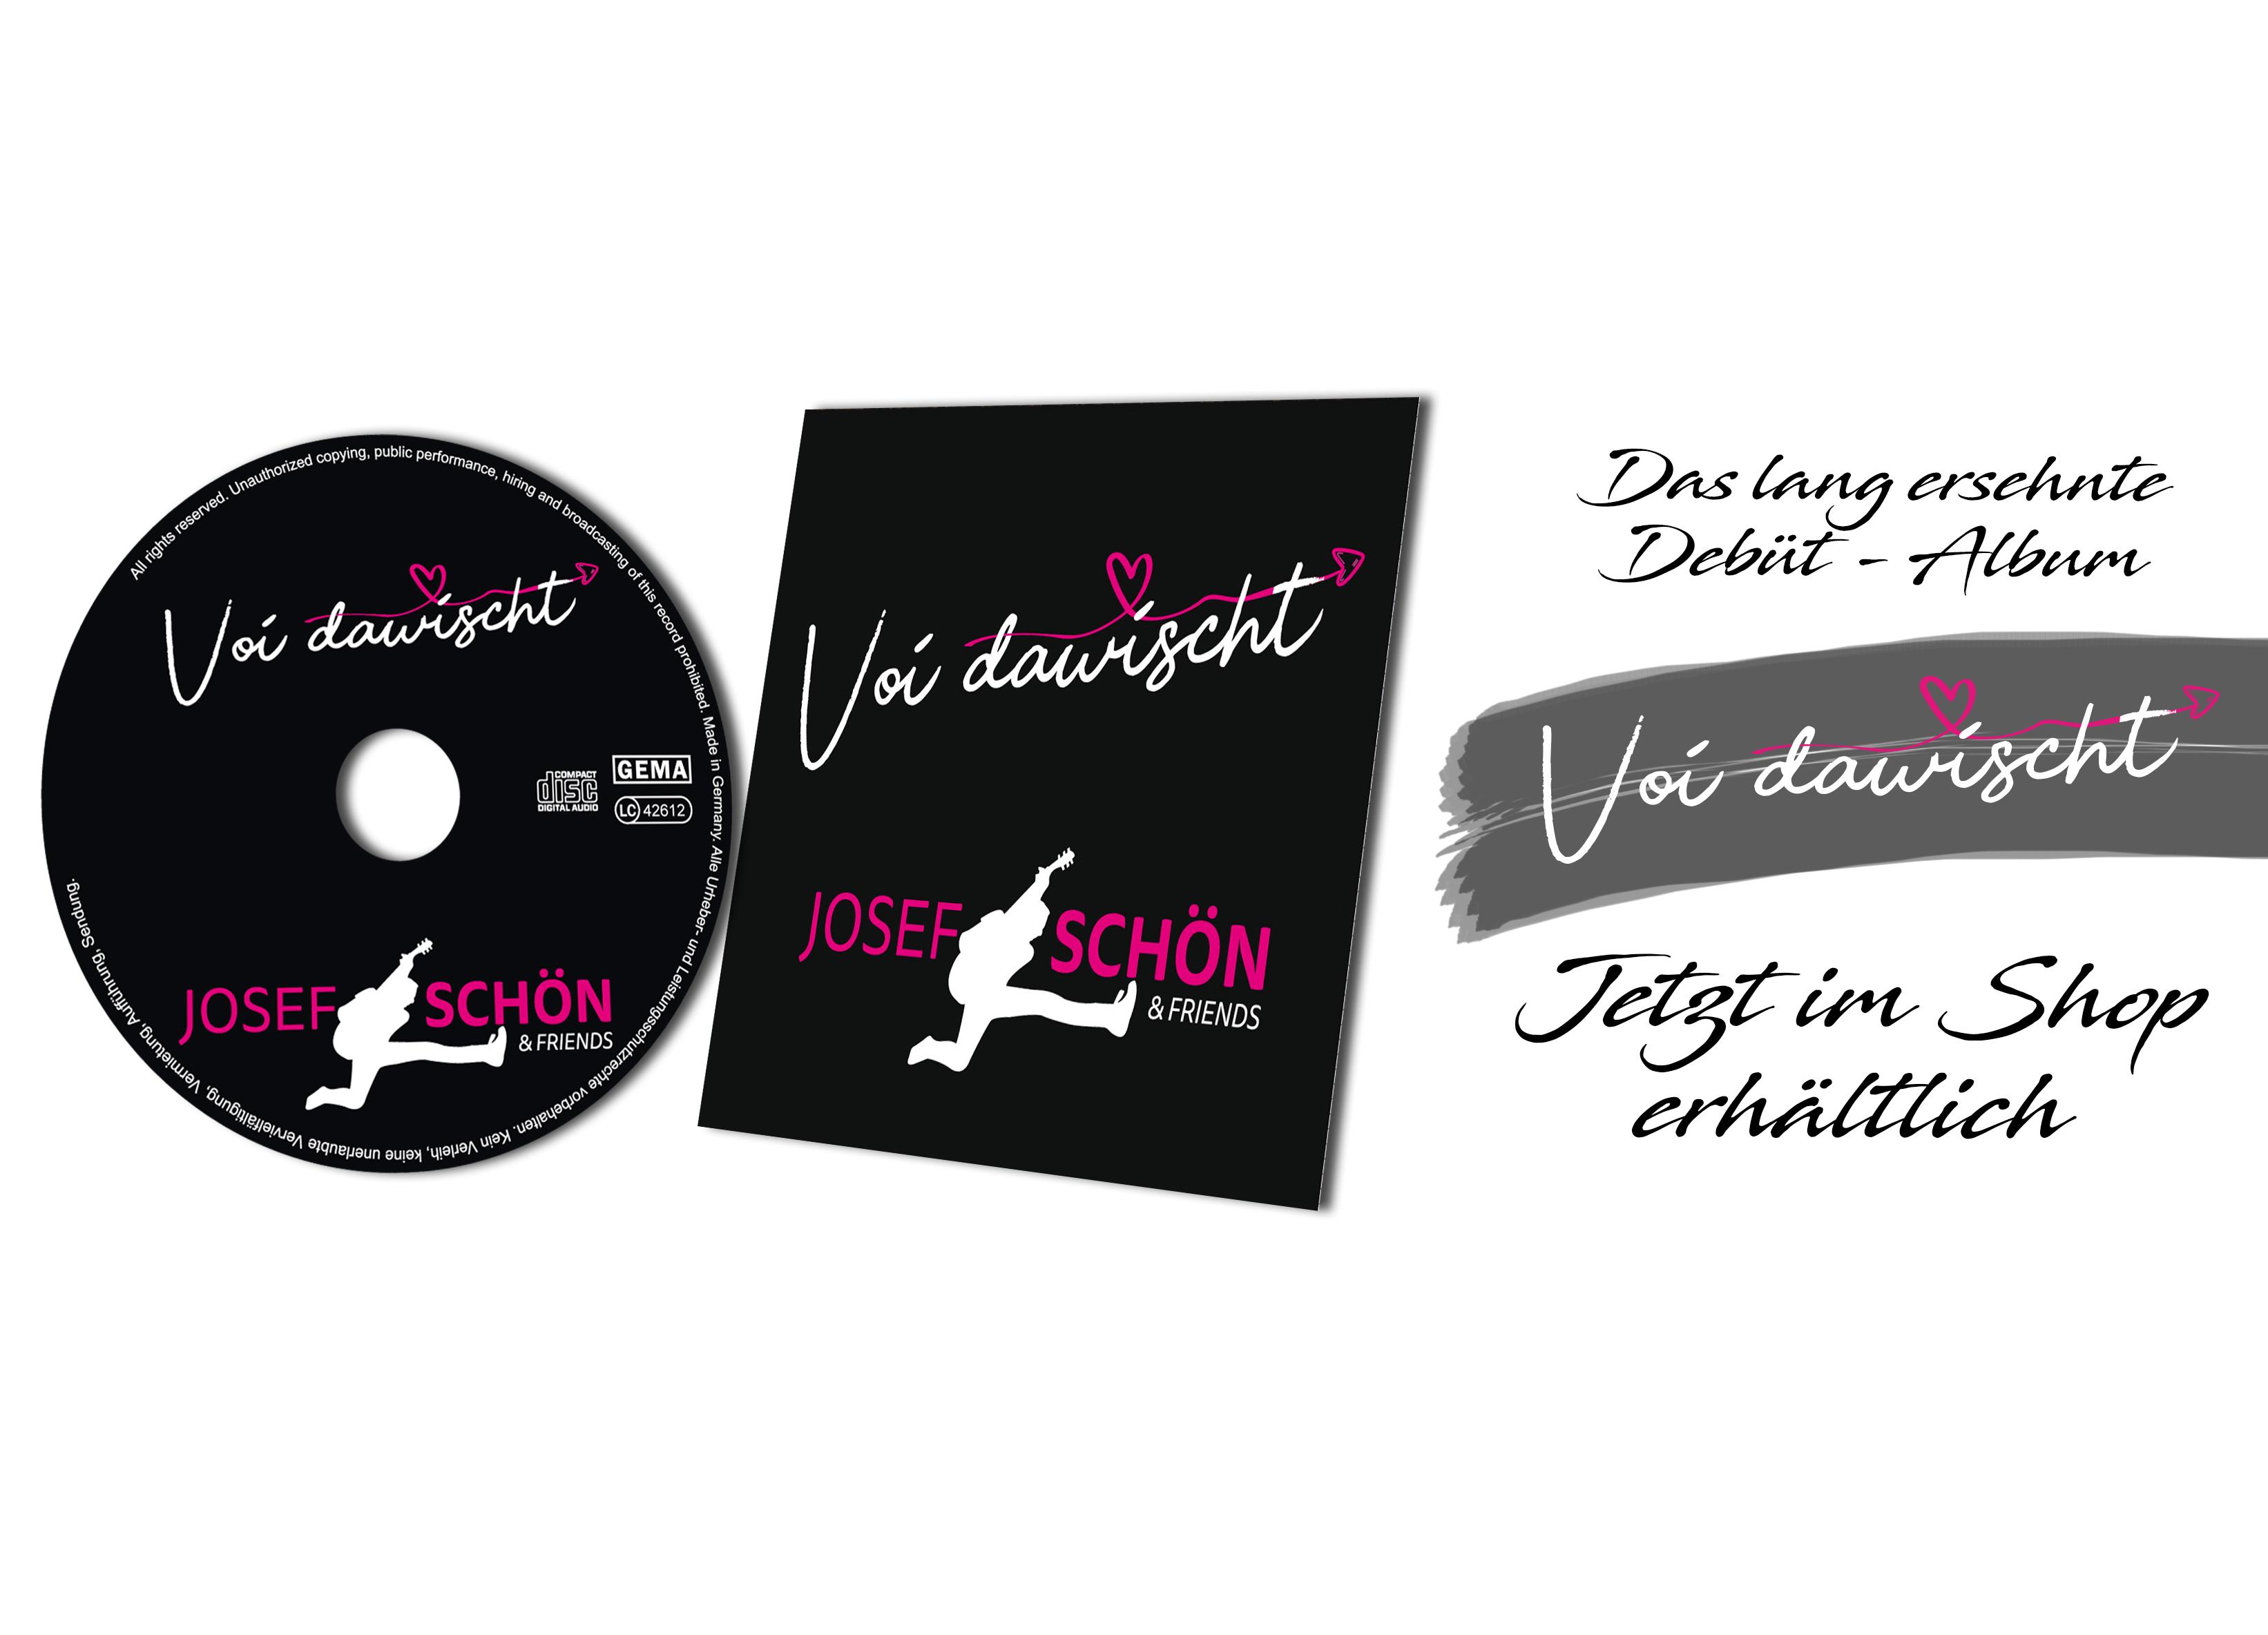 Josef Schön and Friends CD Release Ab jetzt erhätltch